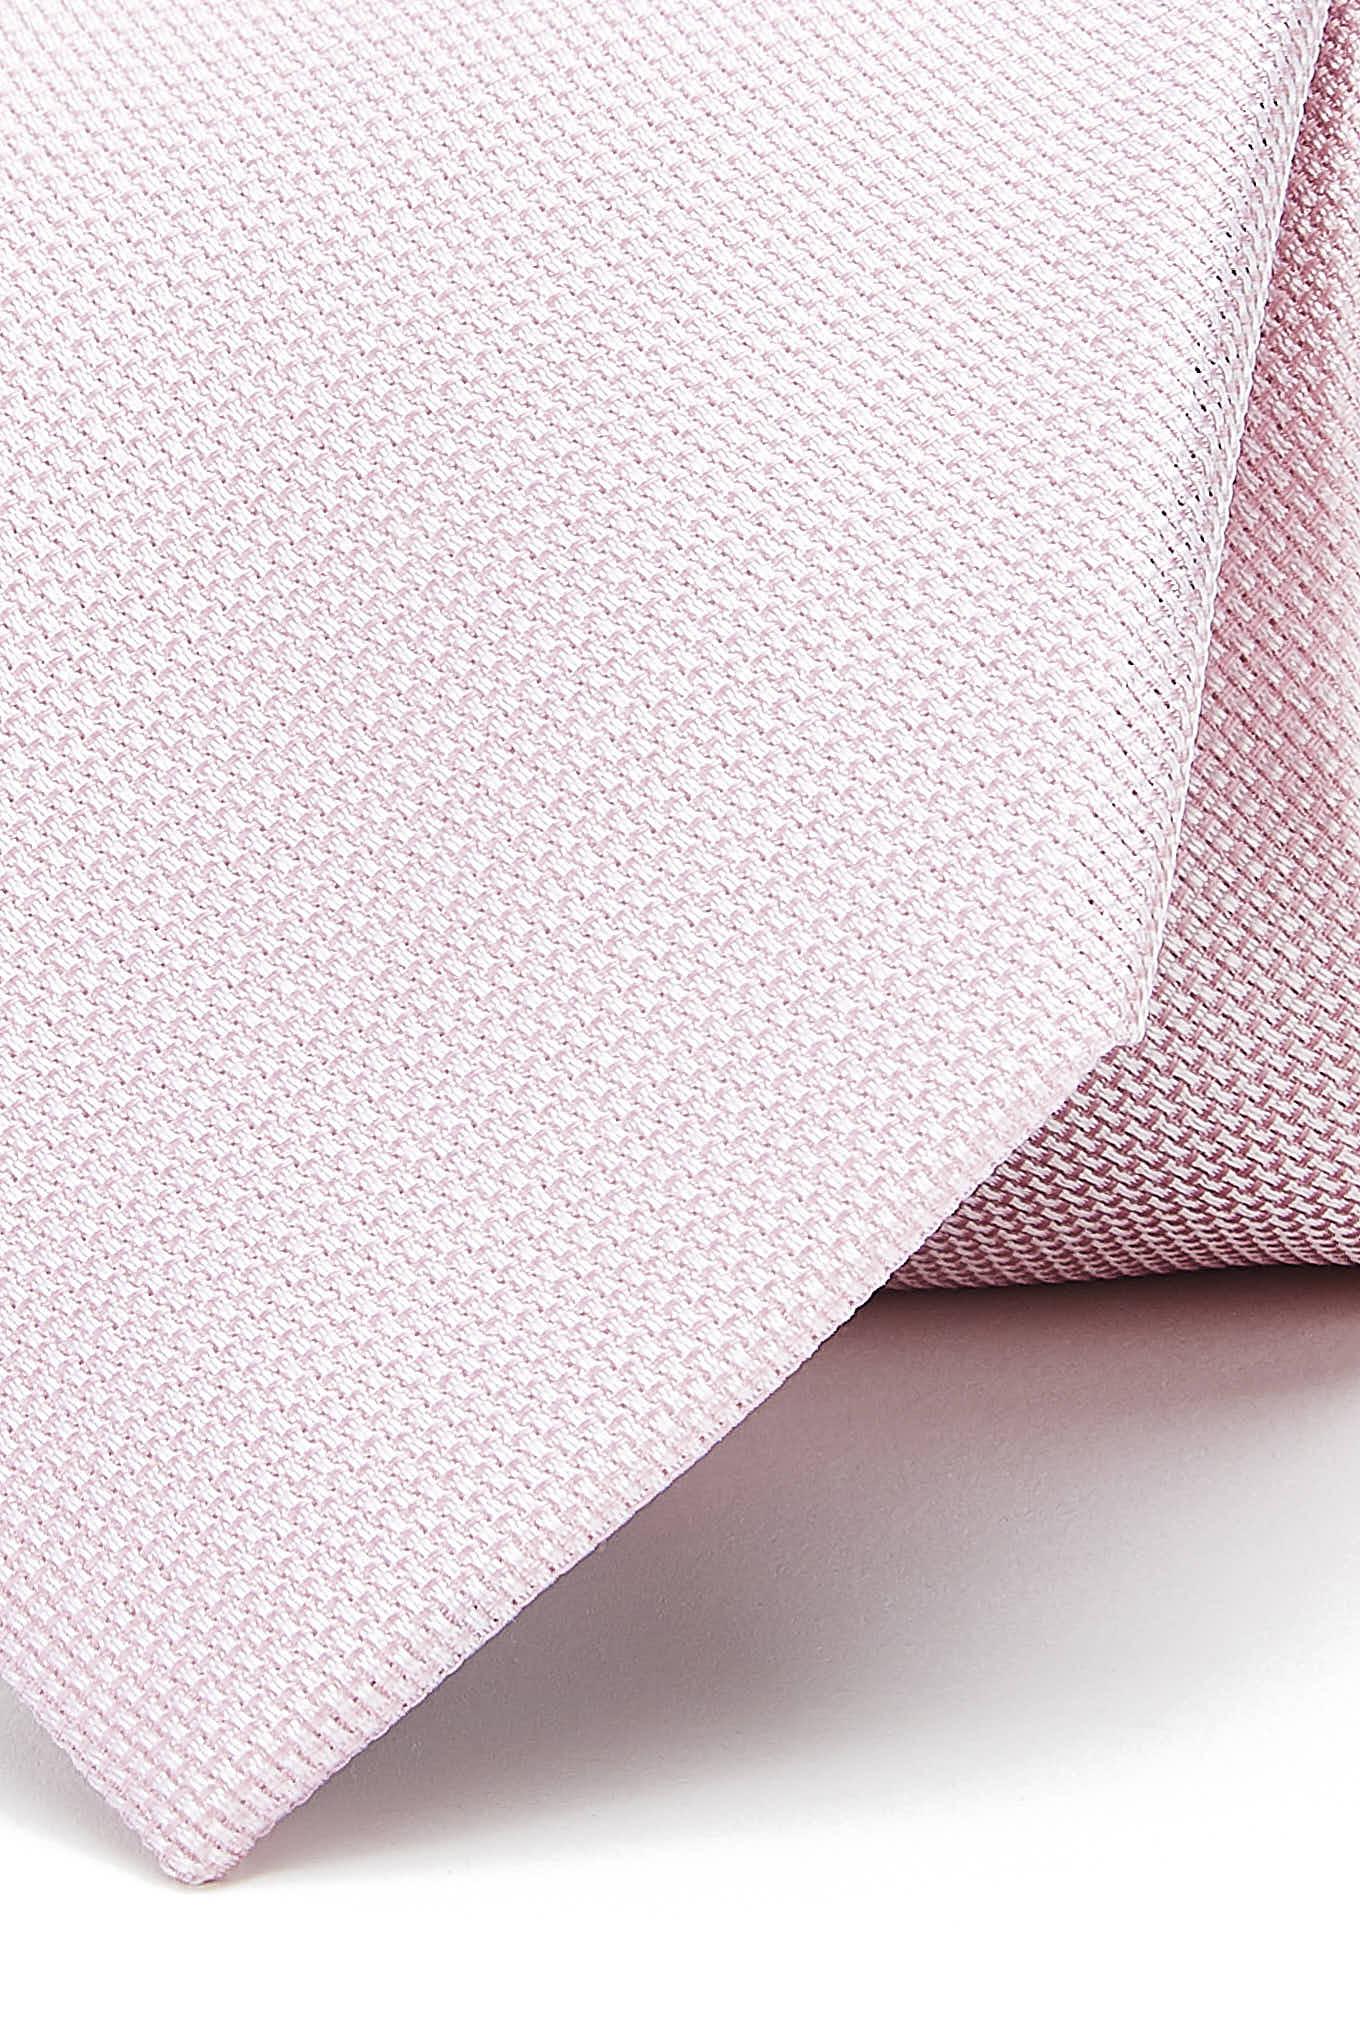 Tie Pink Classic Man